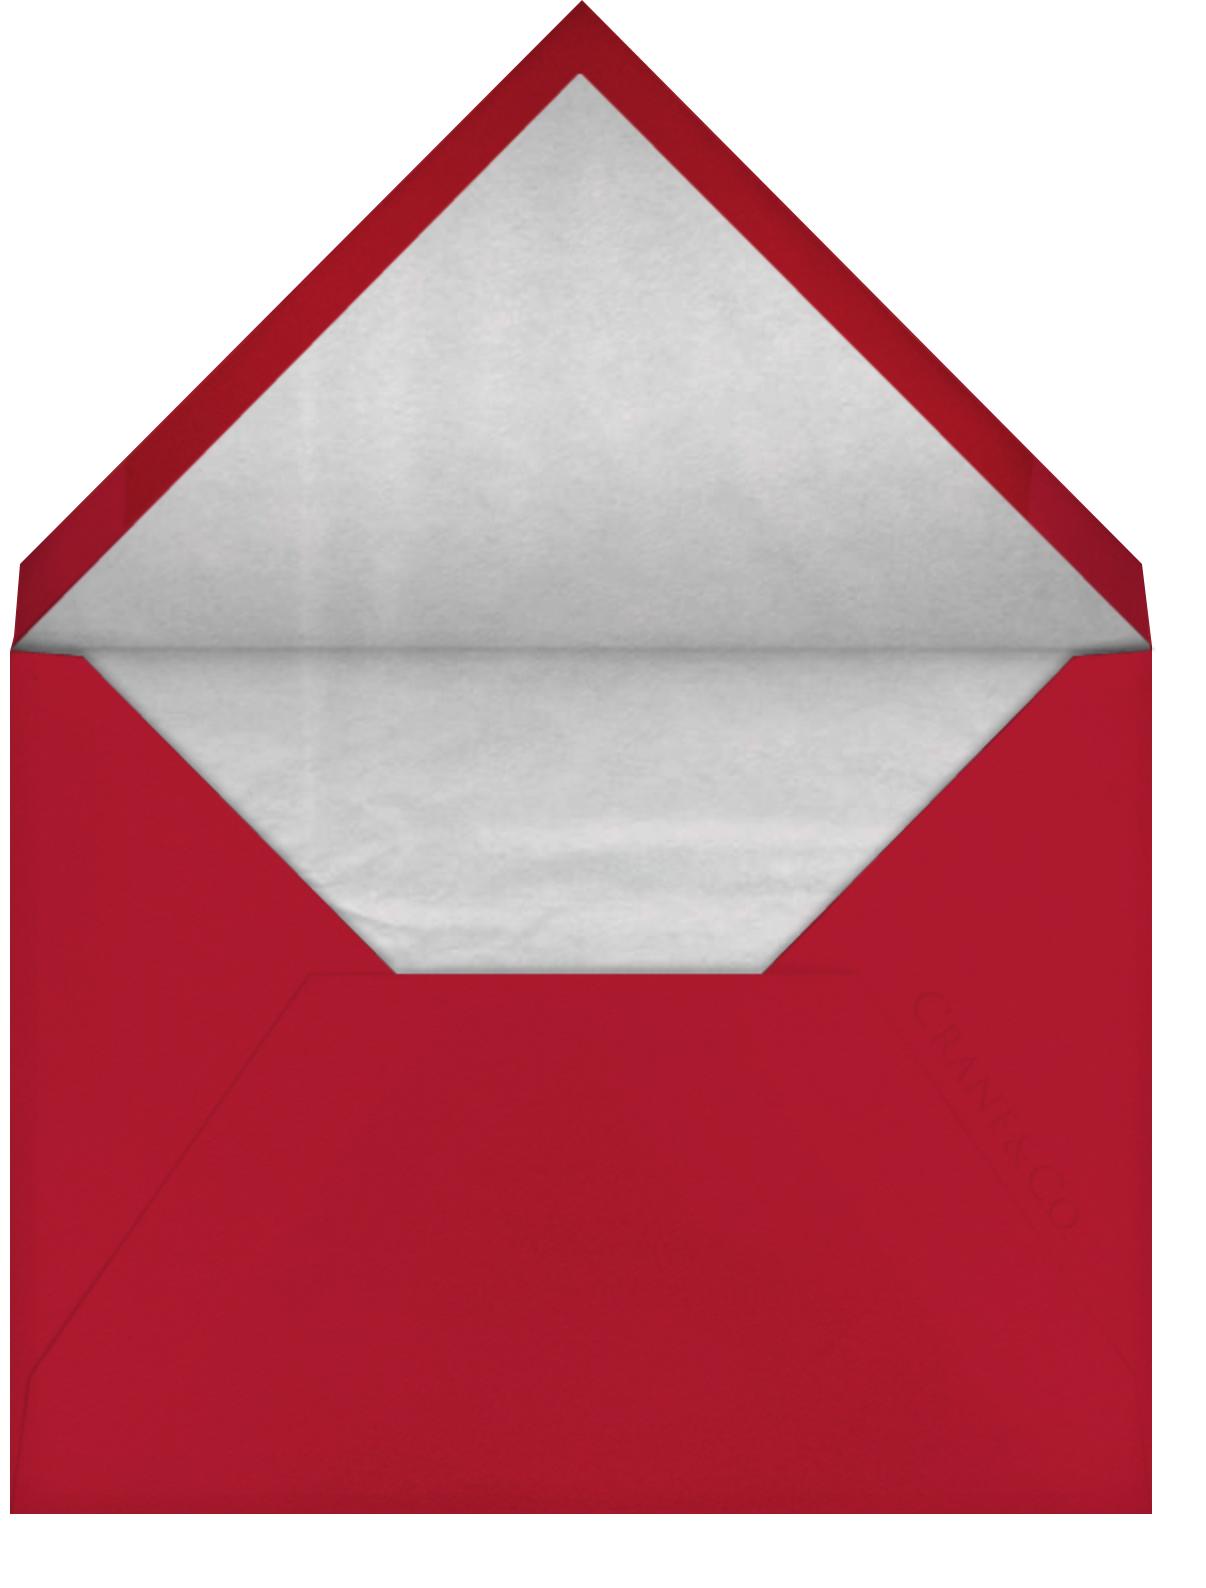 Vine Dove - White (Engraving) - Paperless Post - Holiday cards - envelope back